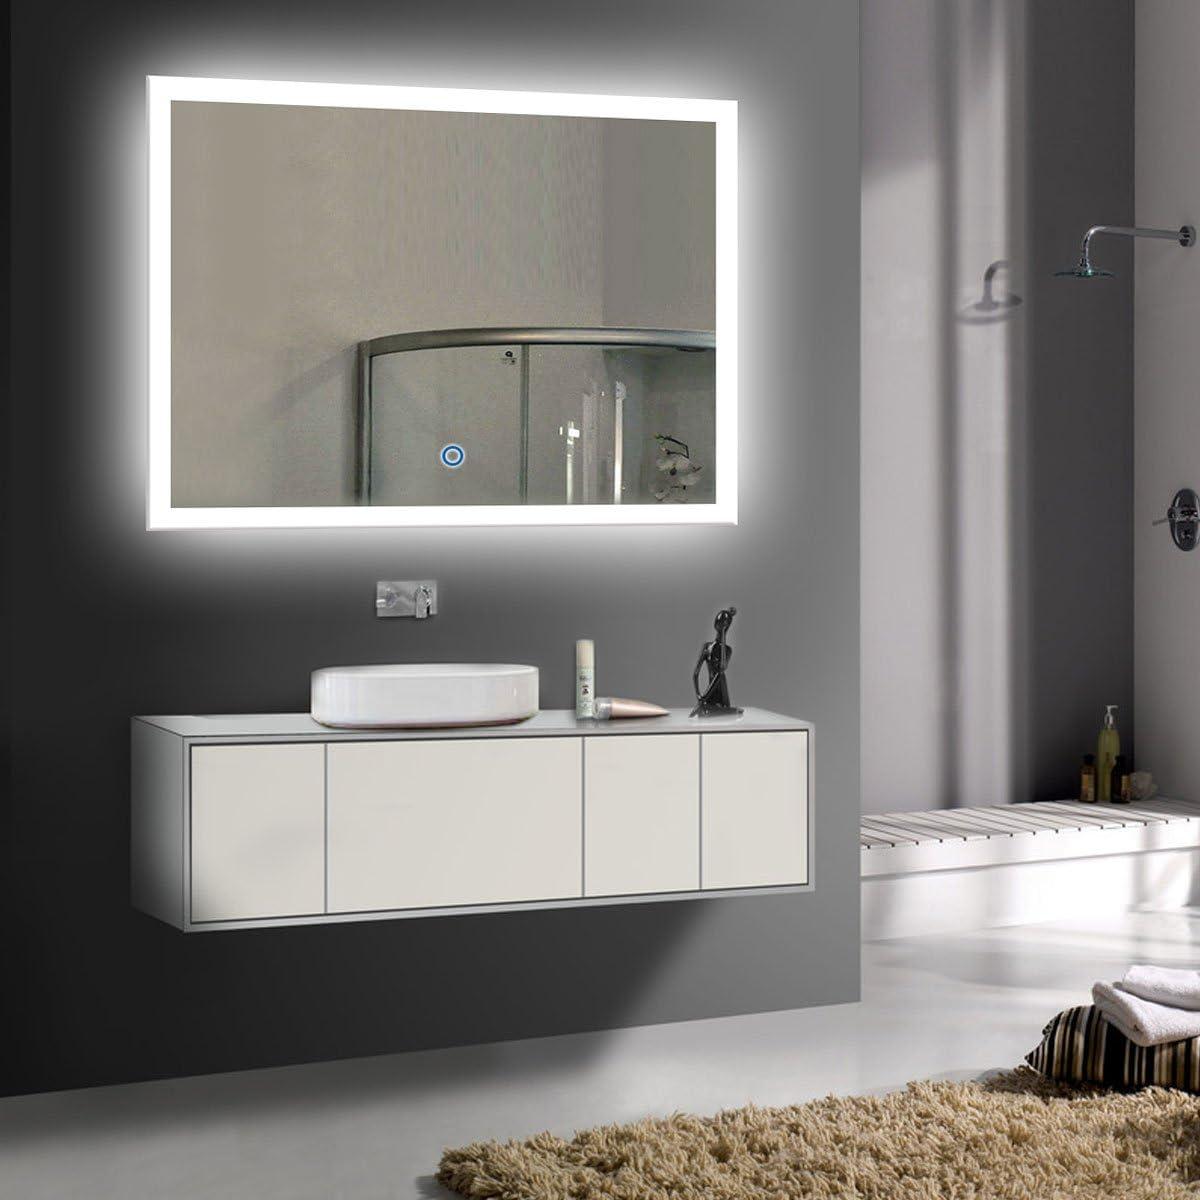 36 x 2020秋冬新作 28 in Horizontal LED Bathroom Silvered Bu Touch お得クーポン発行中 Mirror with